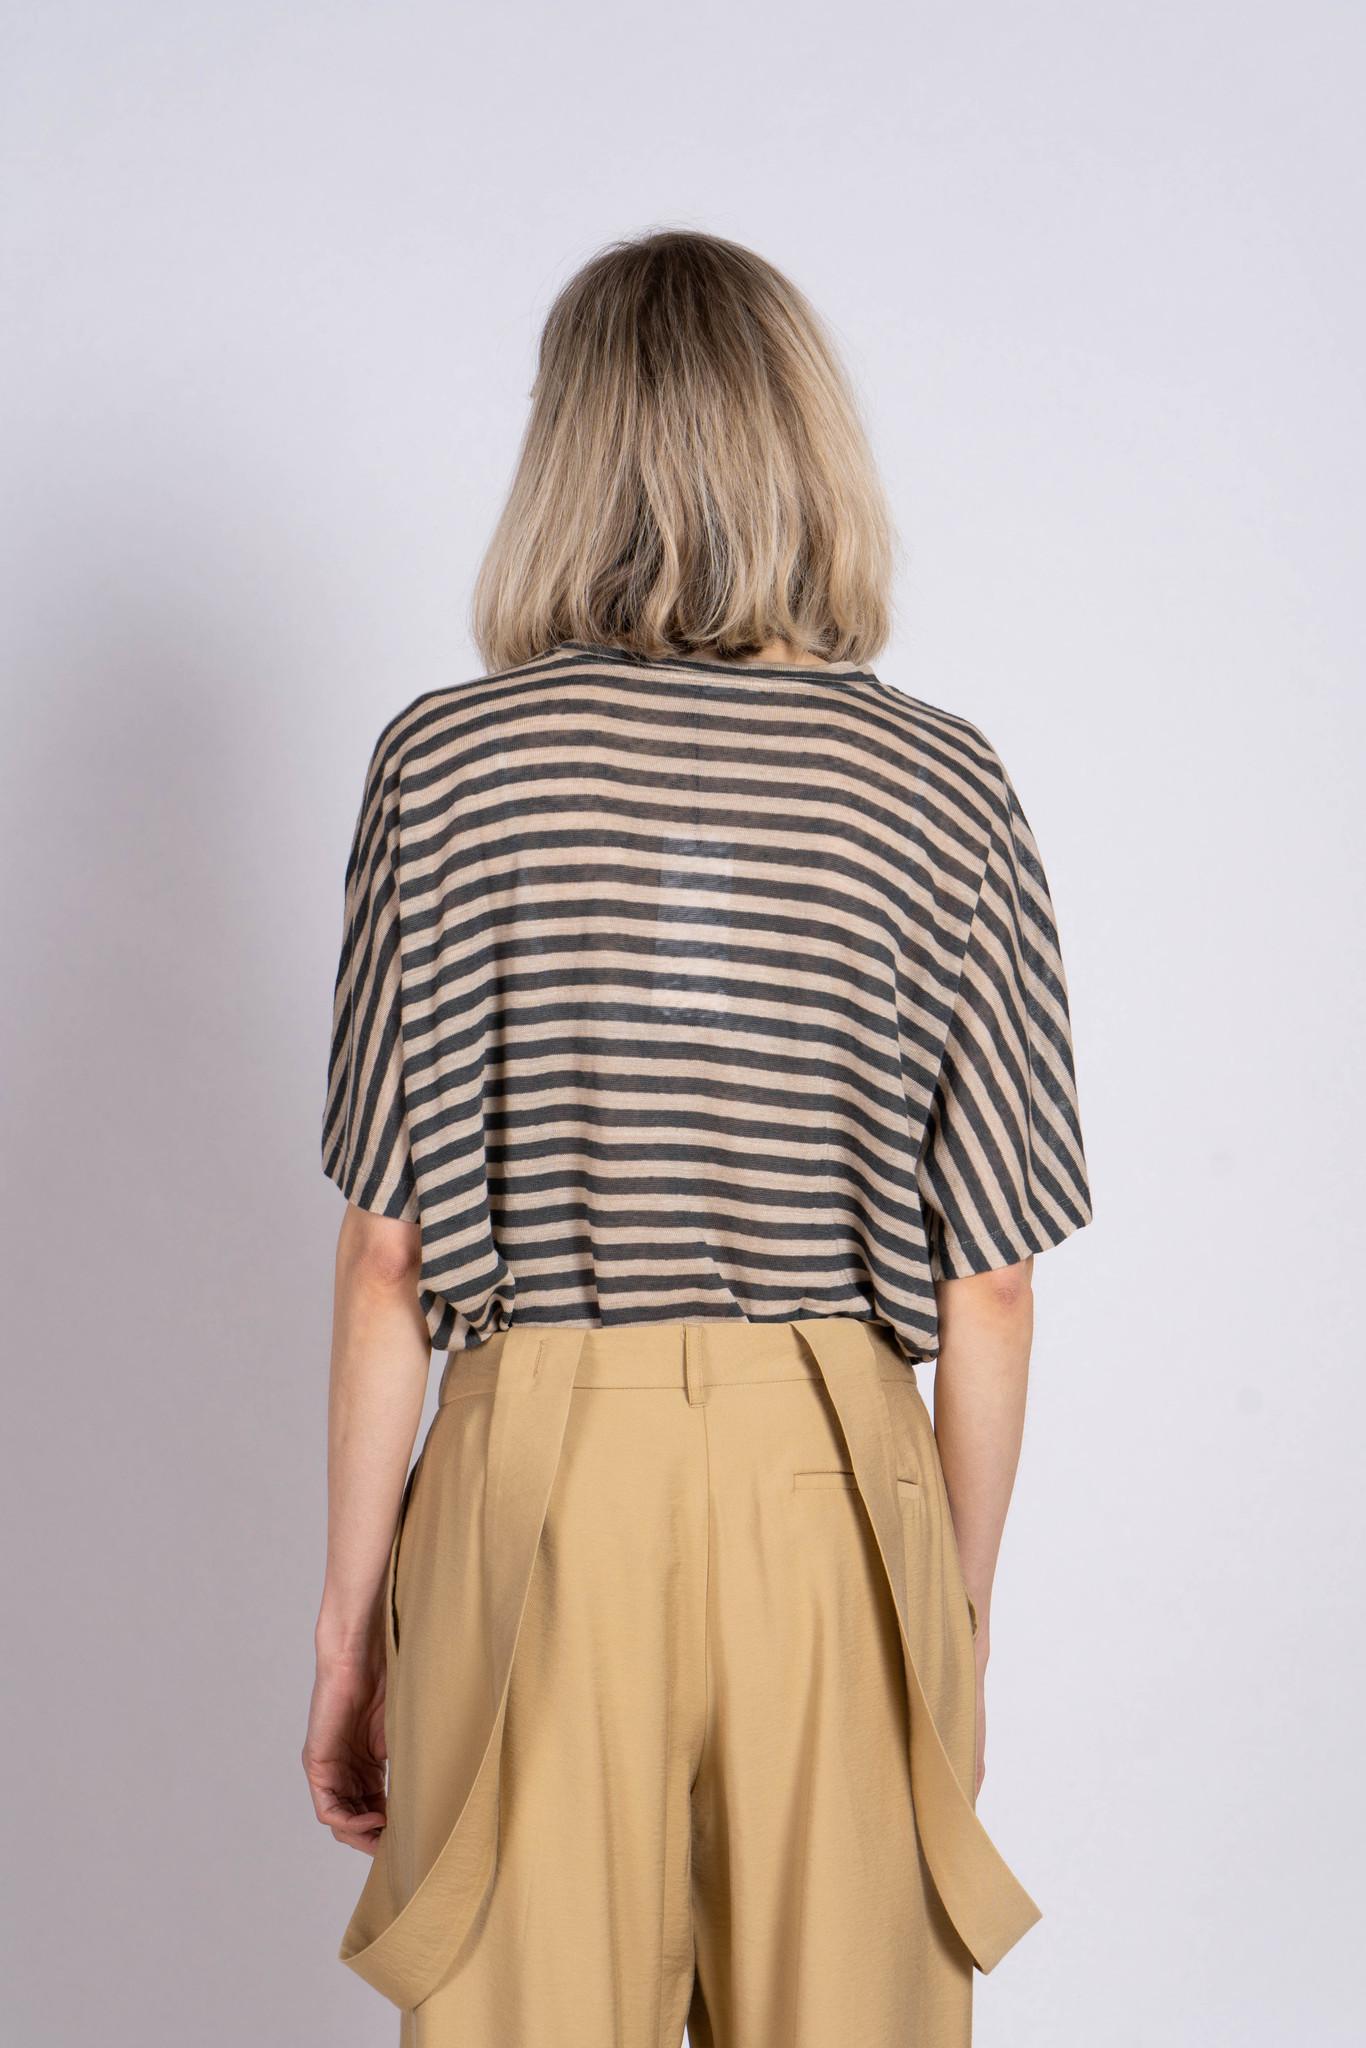 Pocket T-shirt Grey Beige Stripe